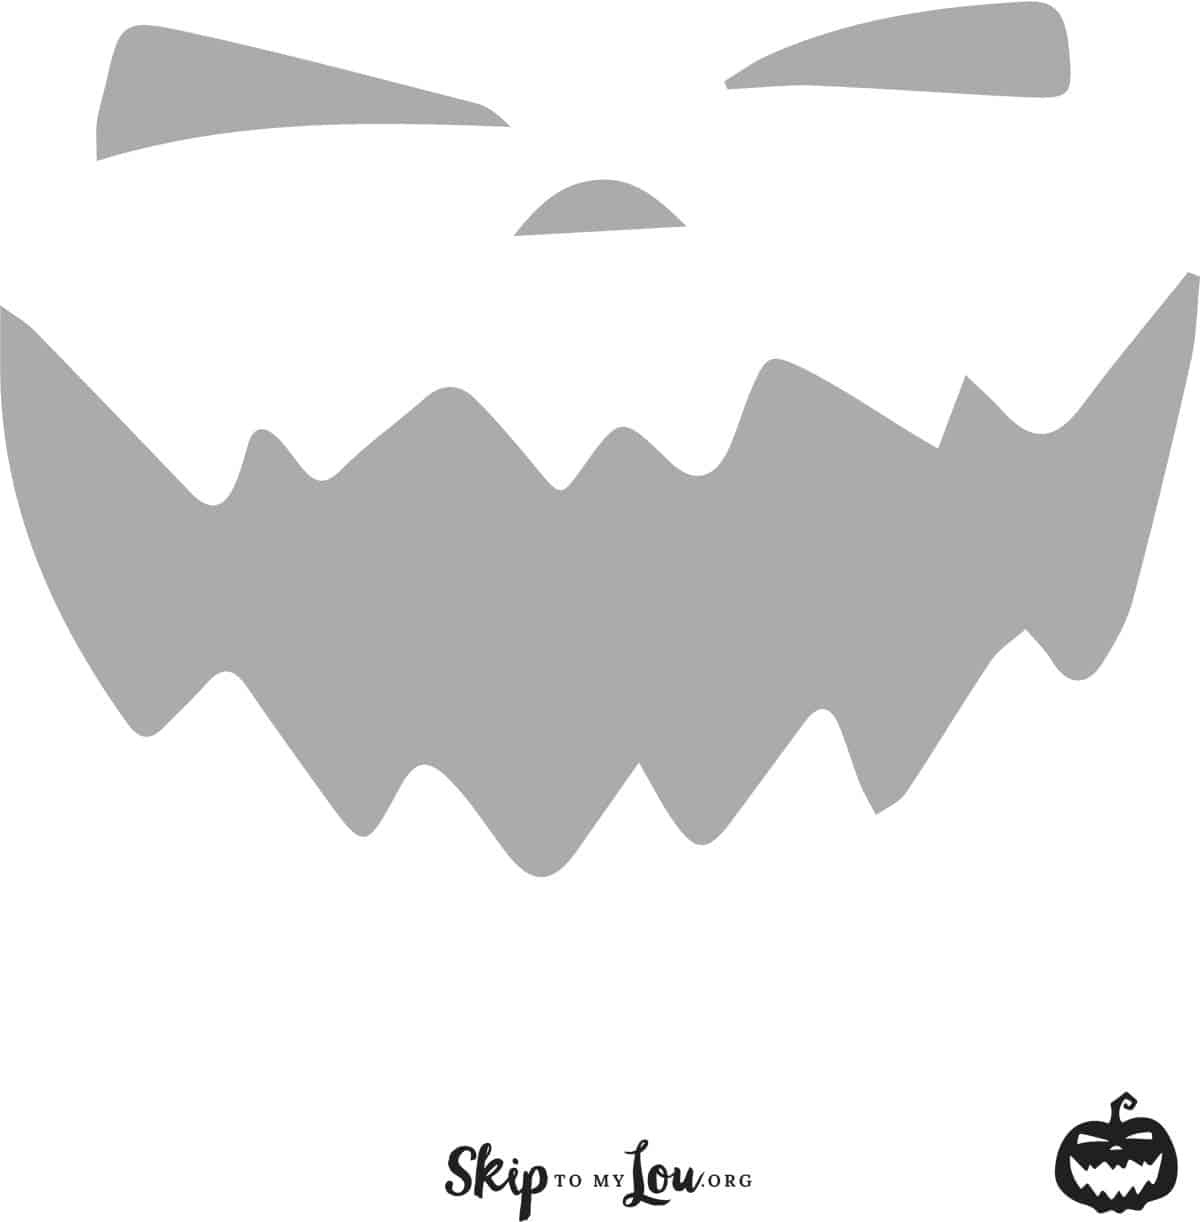 Cool Free Printable Pumpkin Carving Stencils - Skip To My Lou - Free Printable Pumpkin Stencils